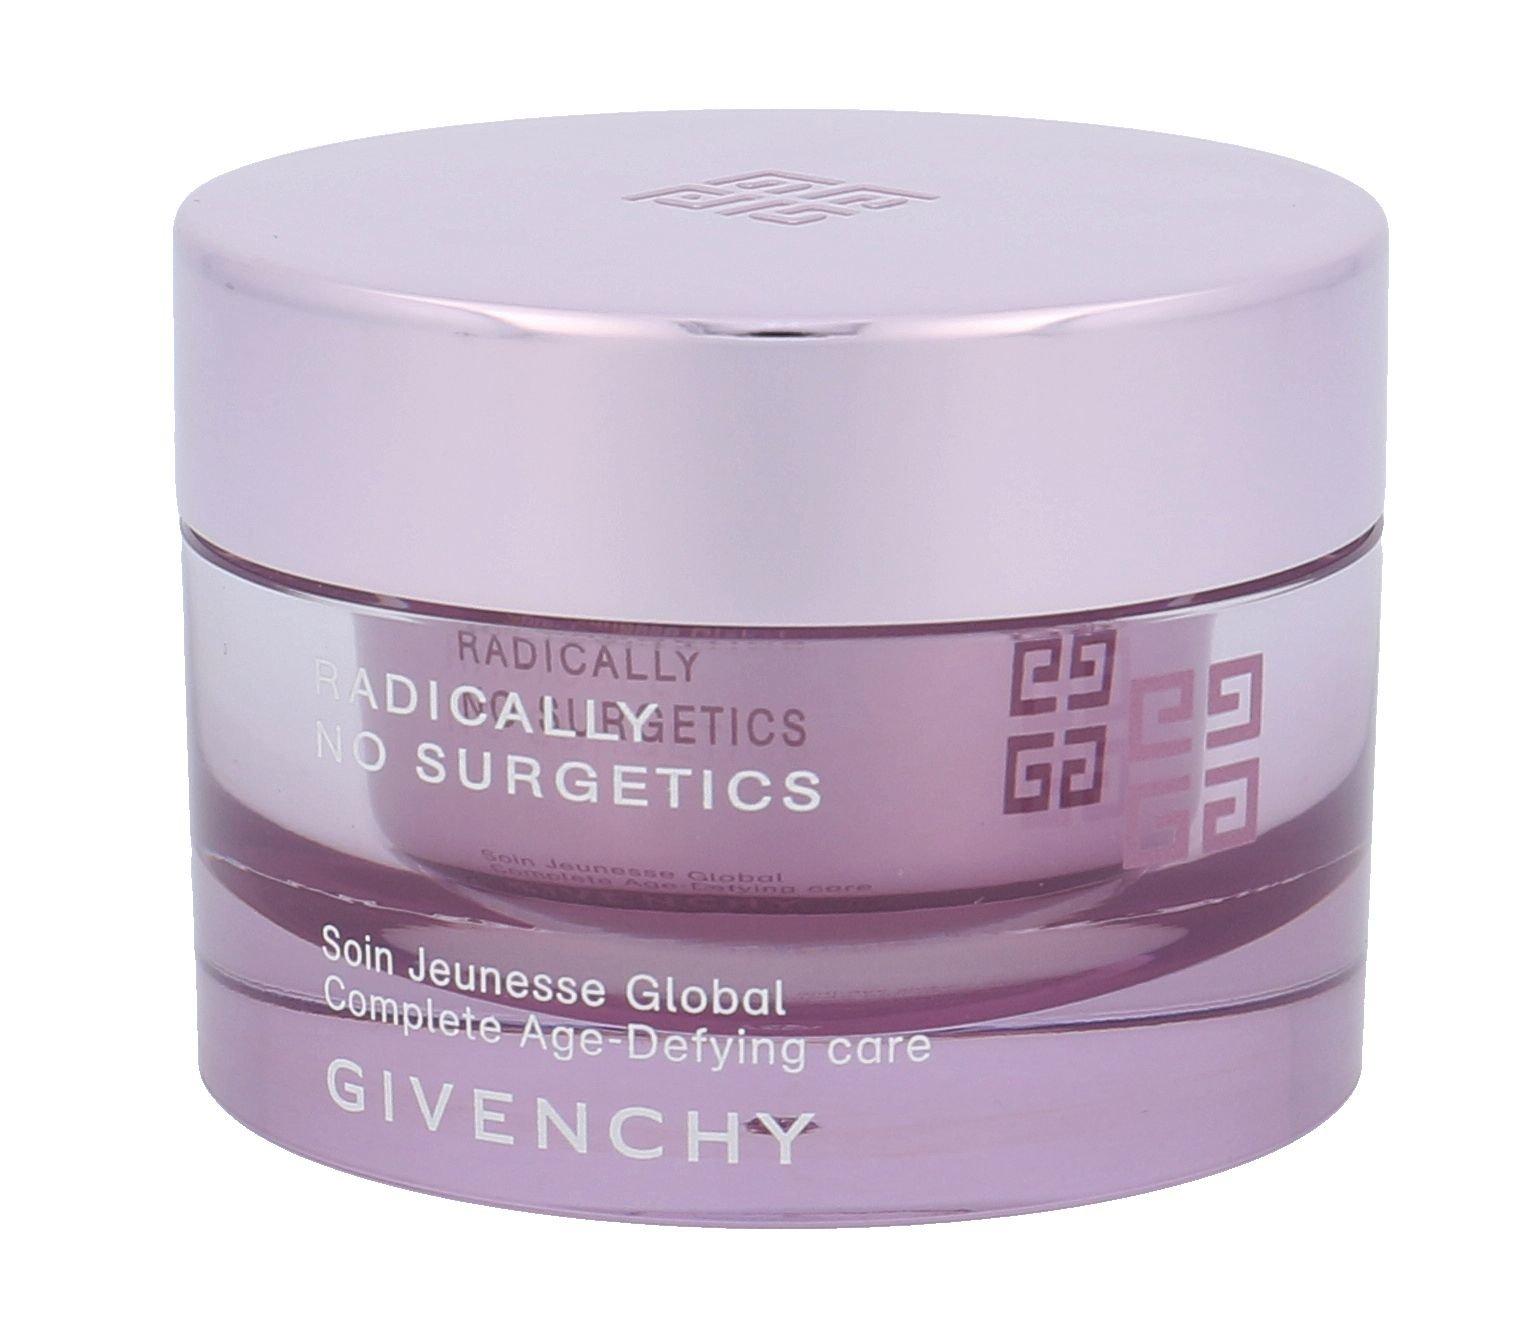 Givenchy Radically No Surgetics Cosmetic 50ml